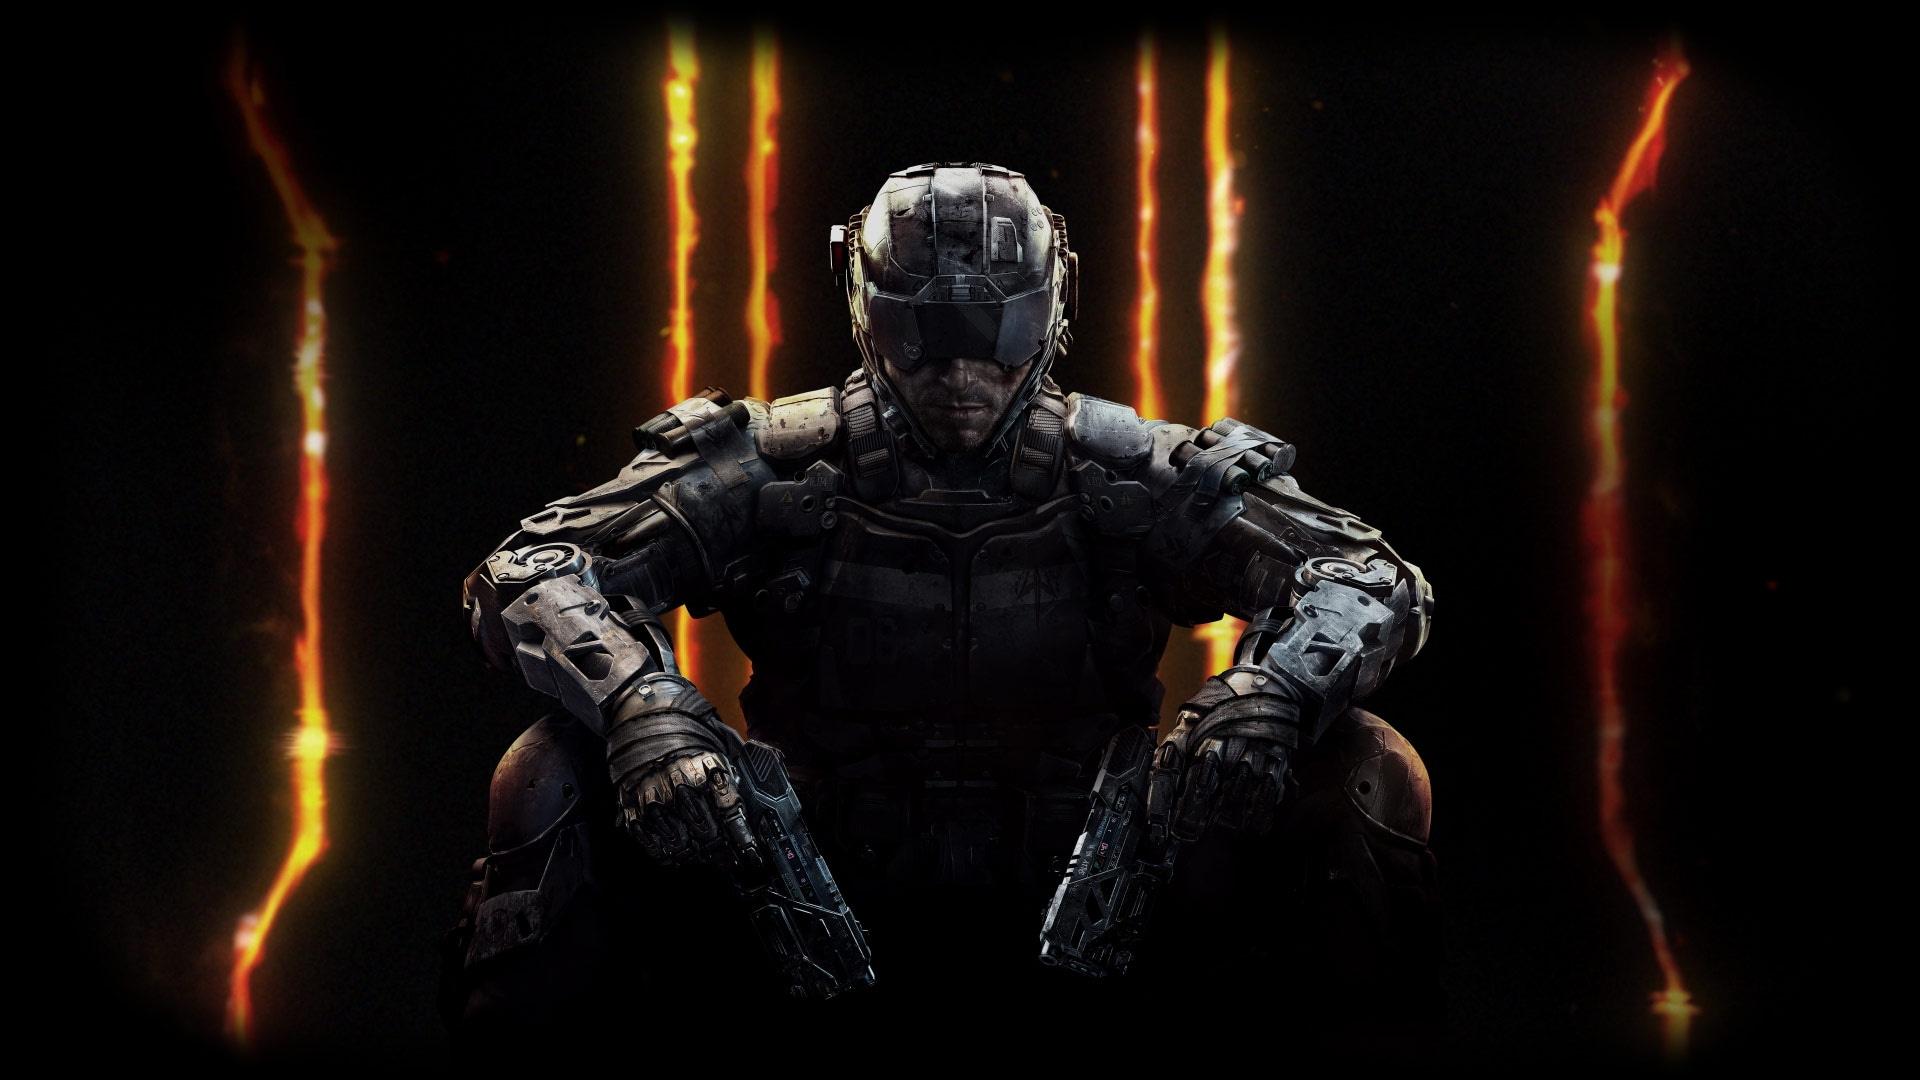 Of Duty Black Ops III HD Wallpapers Backgrounds 1920x1080